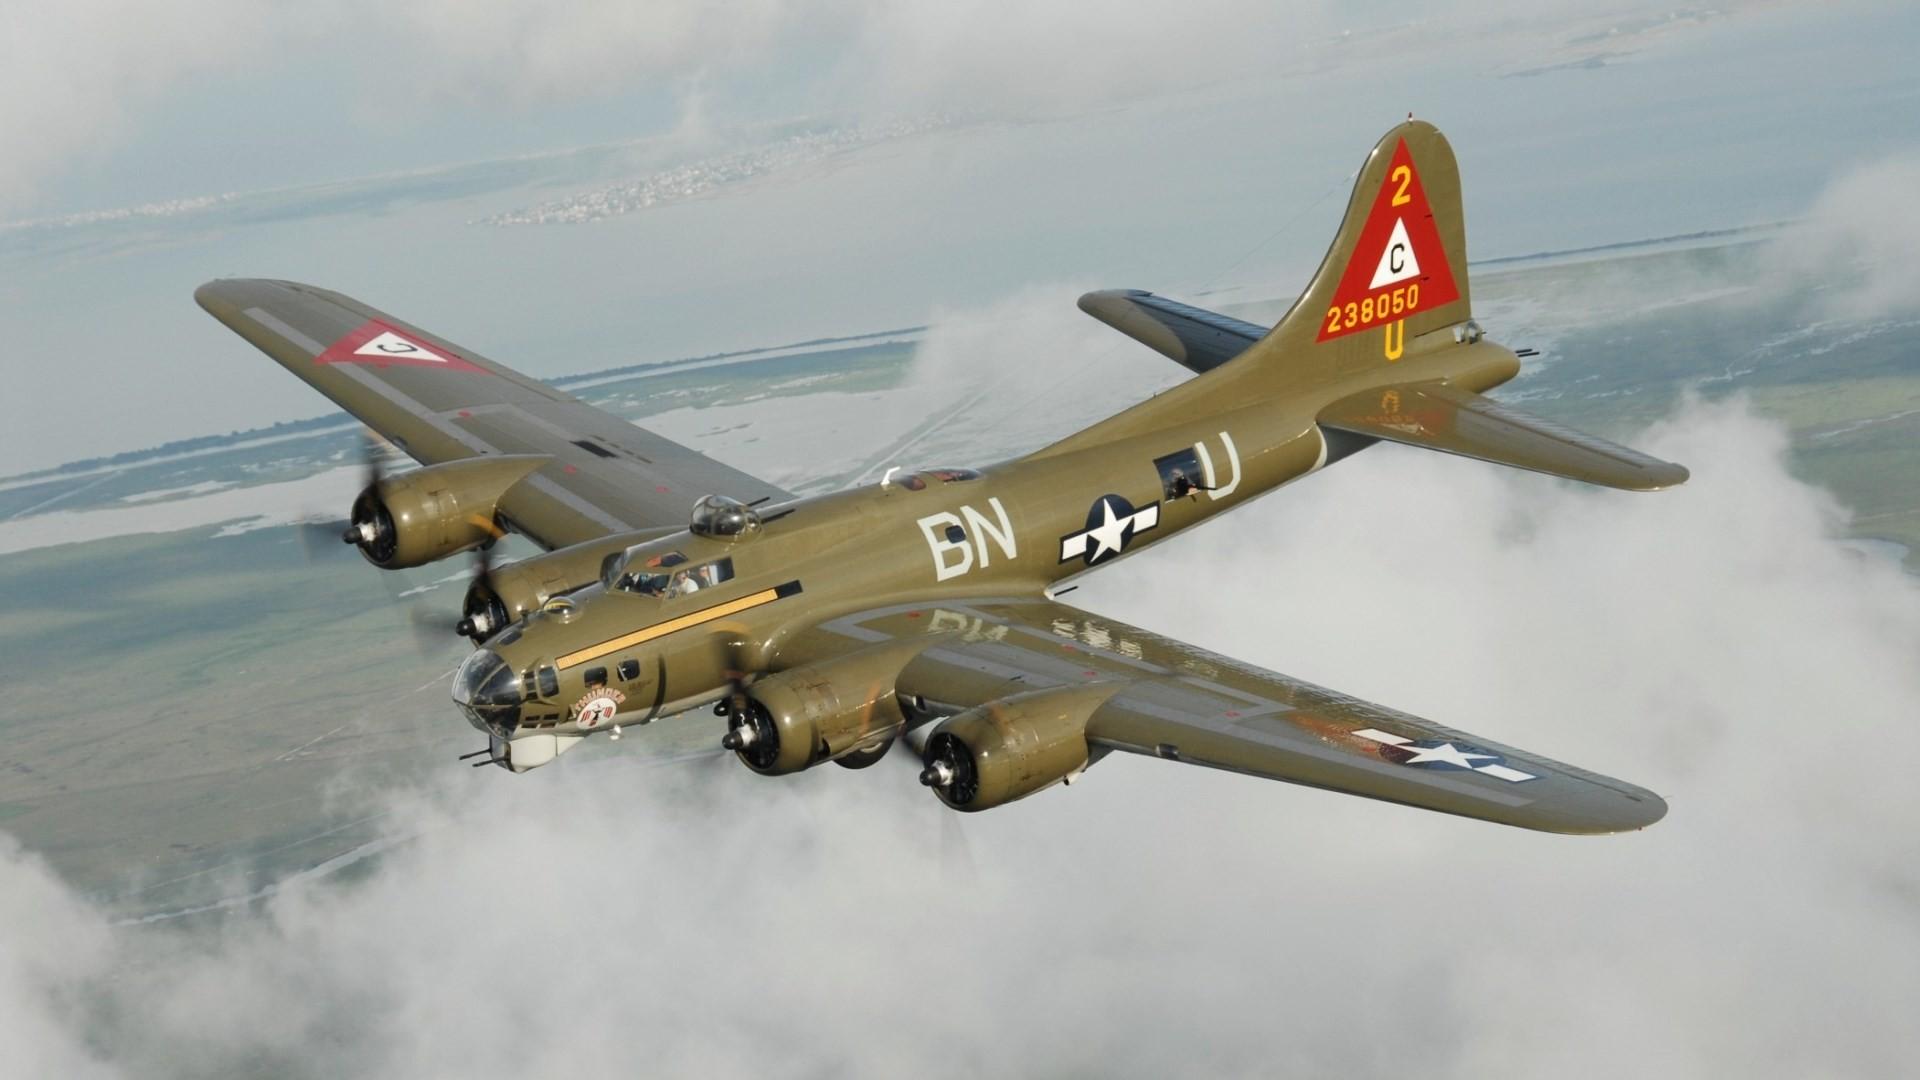 boeing b 17 flying fortress for large desktop 1920×1080